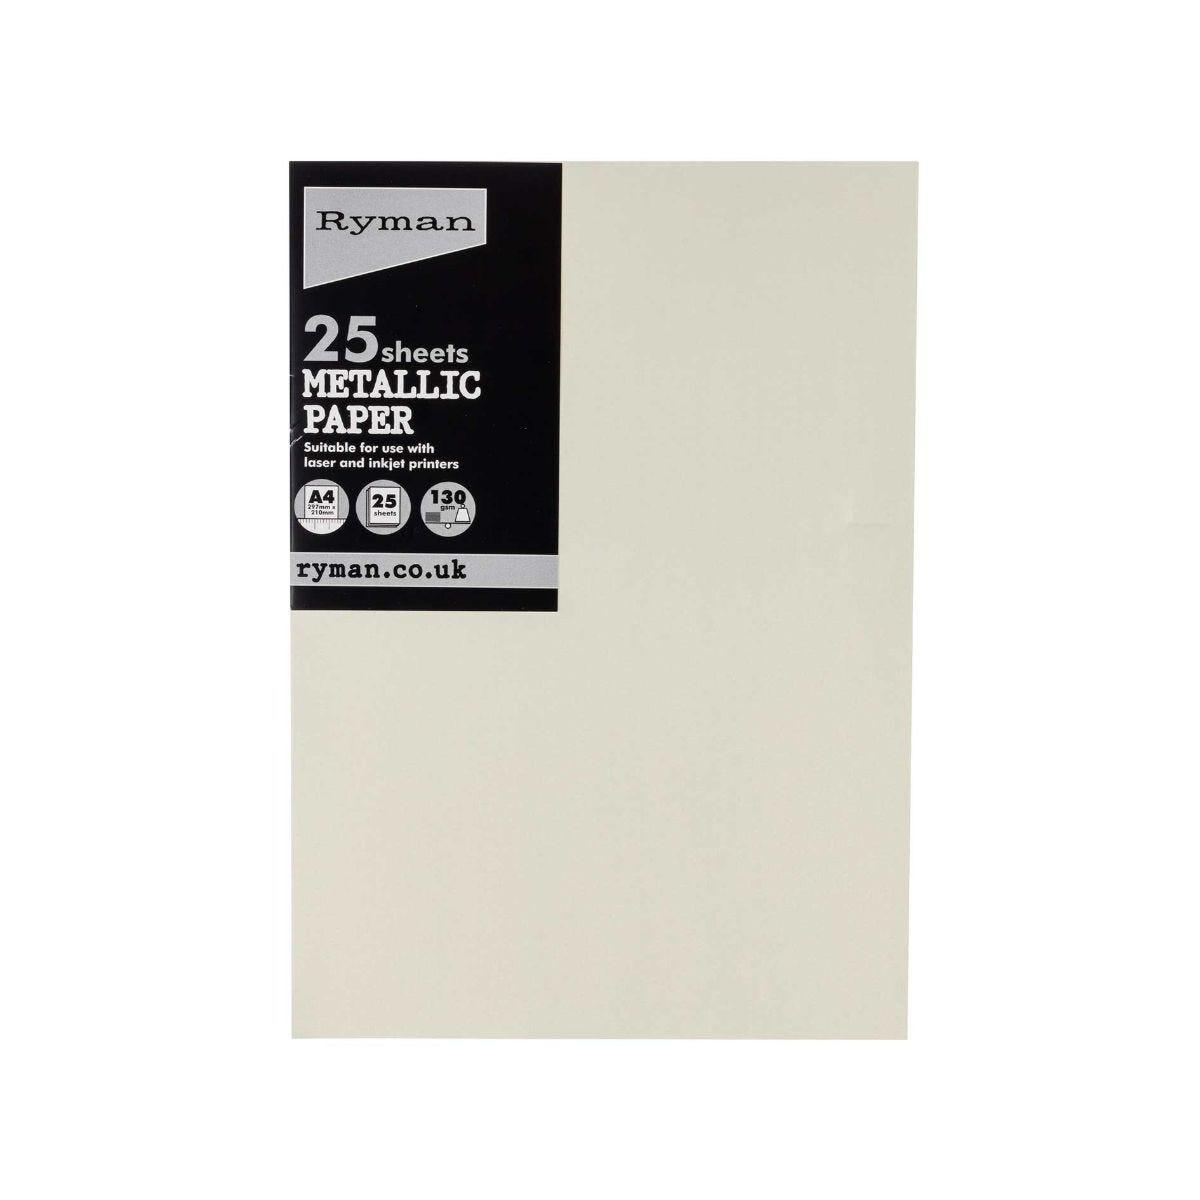 Ryman Metallic Paper A4 Pack of 25 White